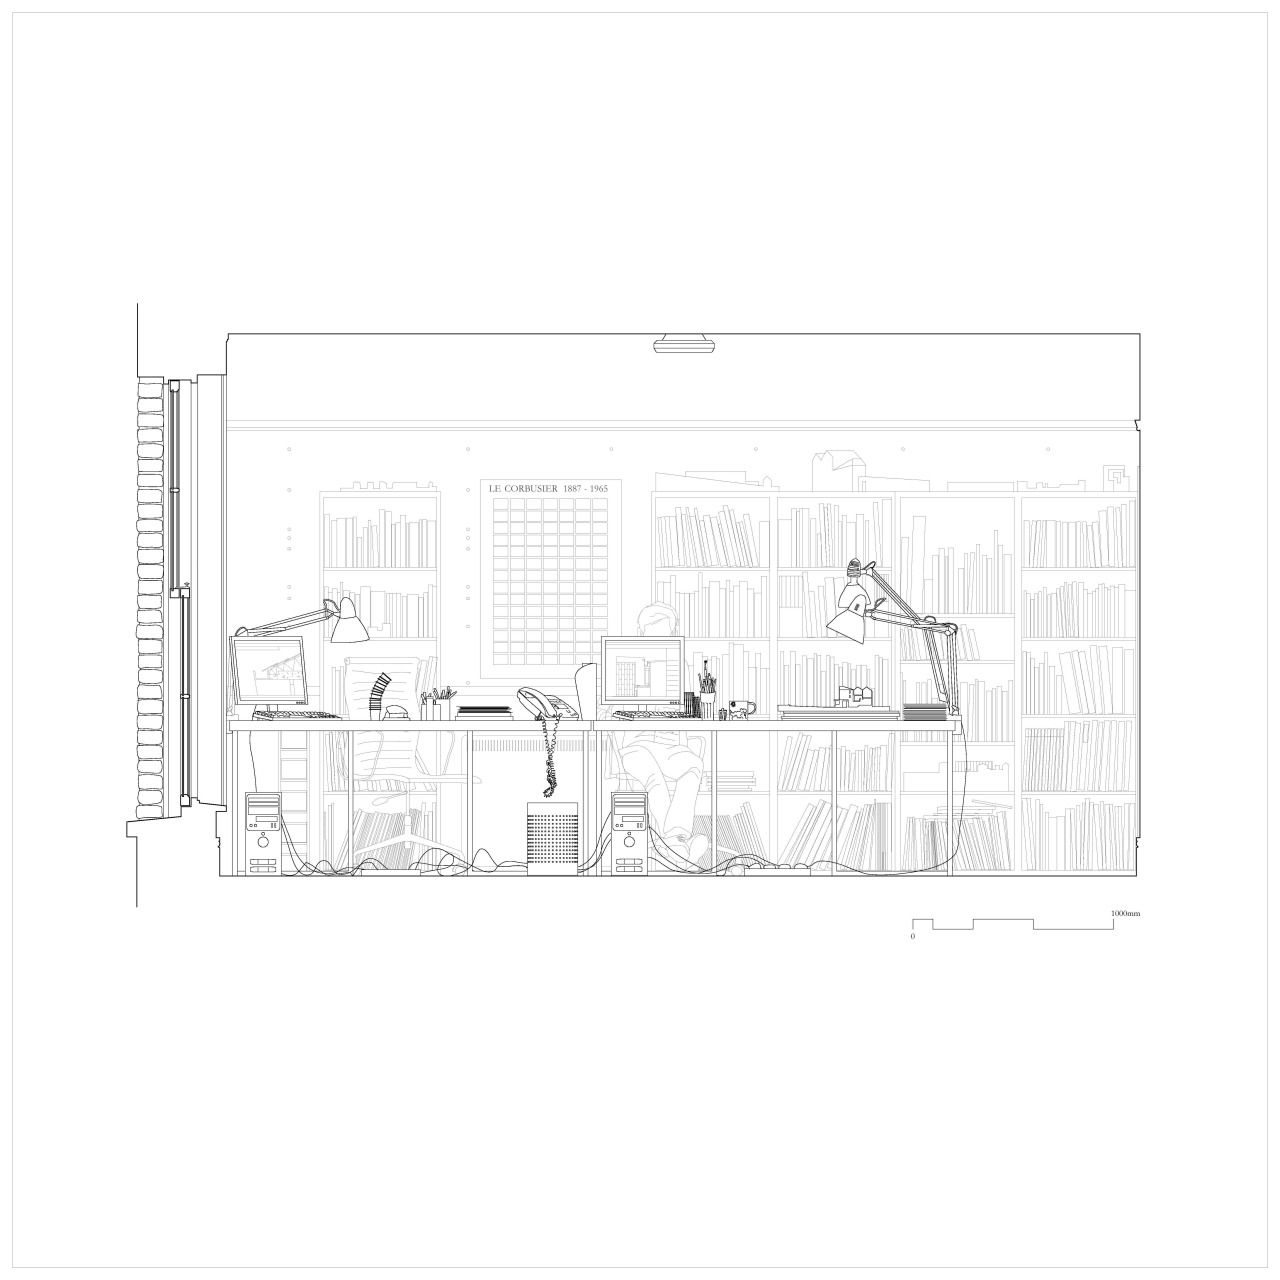 19A Baggot Street Elevation drawing of GKMP Architects office, Baggot Street, Dublin. Image Copyright © 2014 | Jennifer O'Donnell, Jonathan Janssens